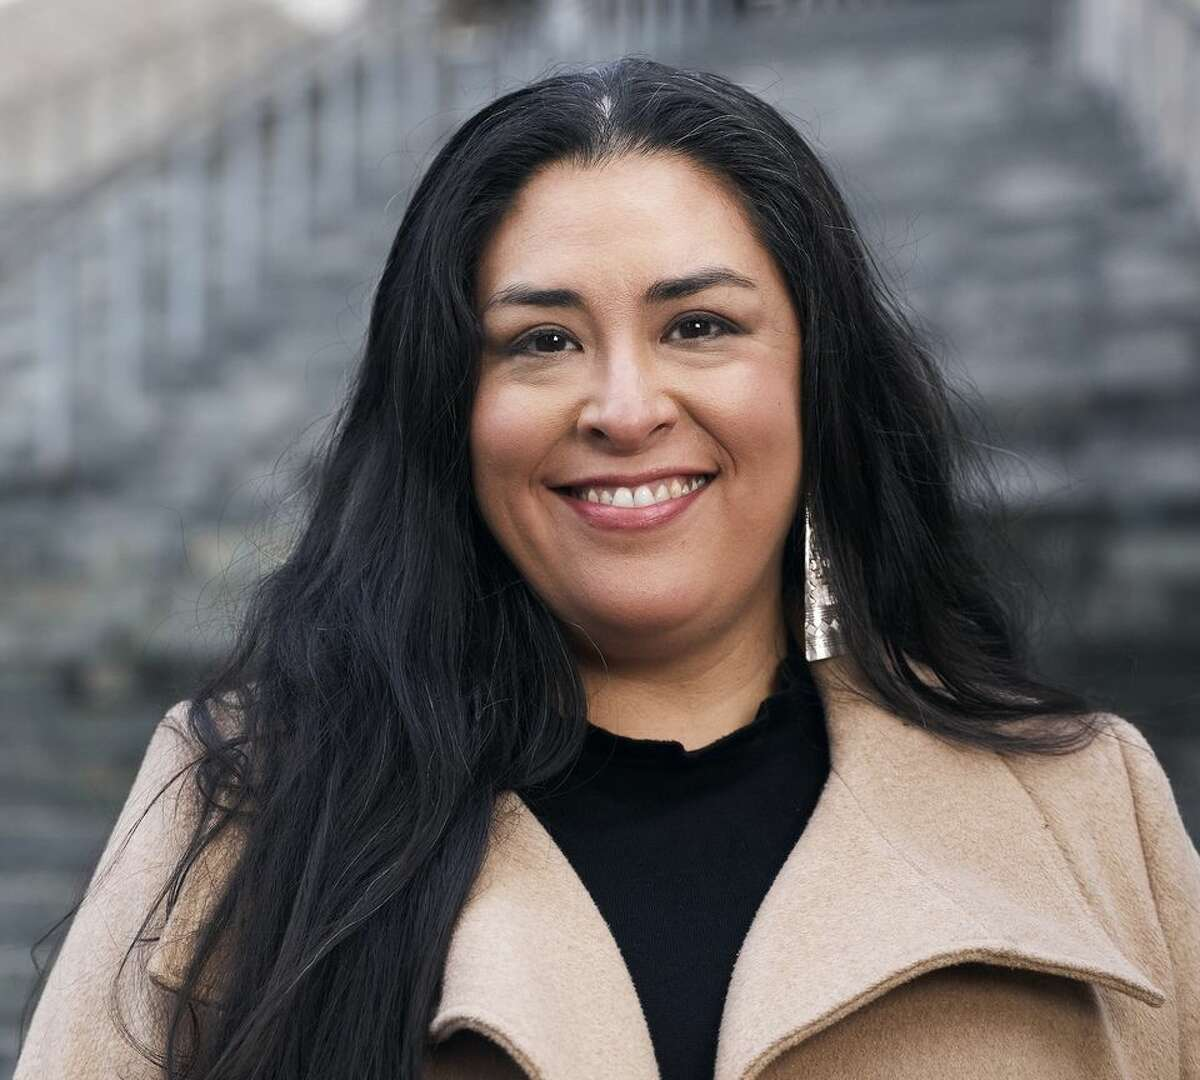 Colleen Echohawk launches bid for Seattle mayor